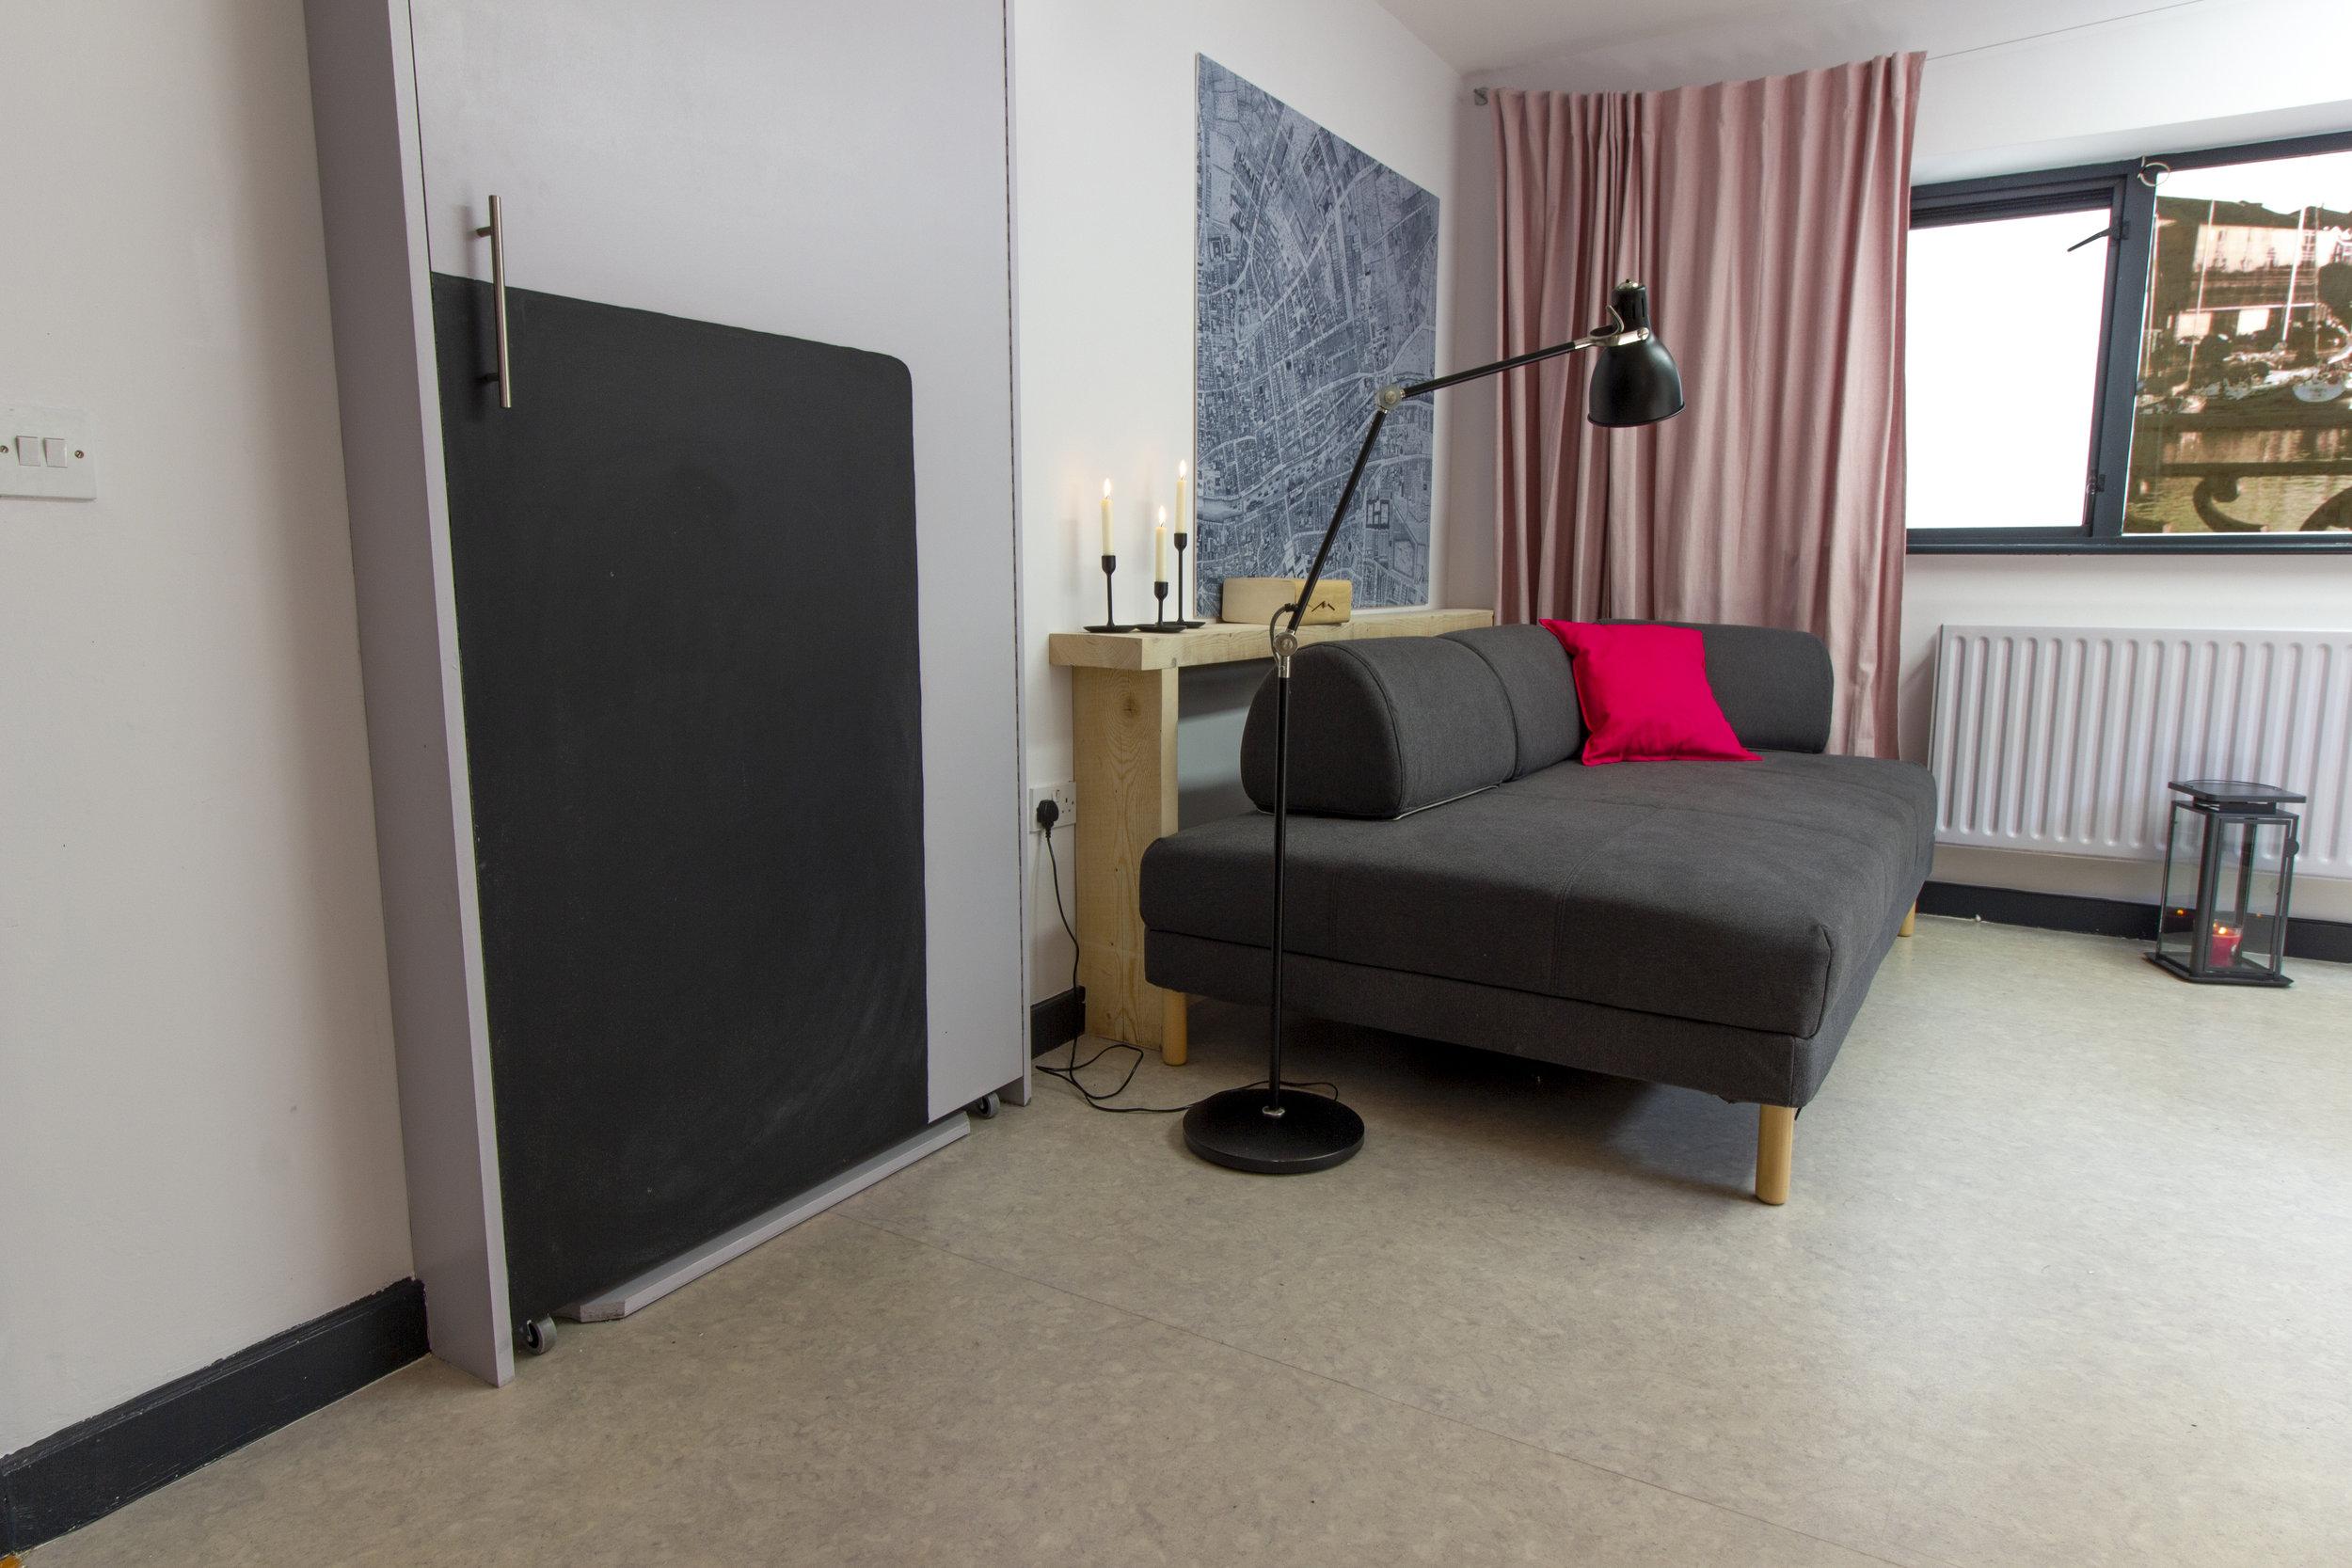 HR - Dublin 1 - After - Living Room Kitchen 20.jpg